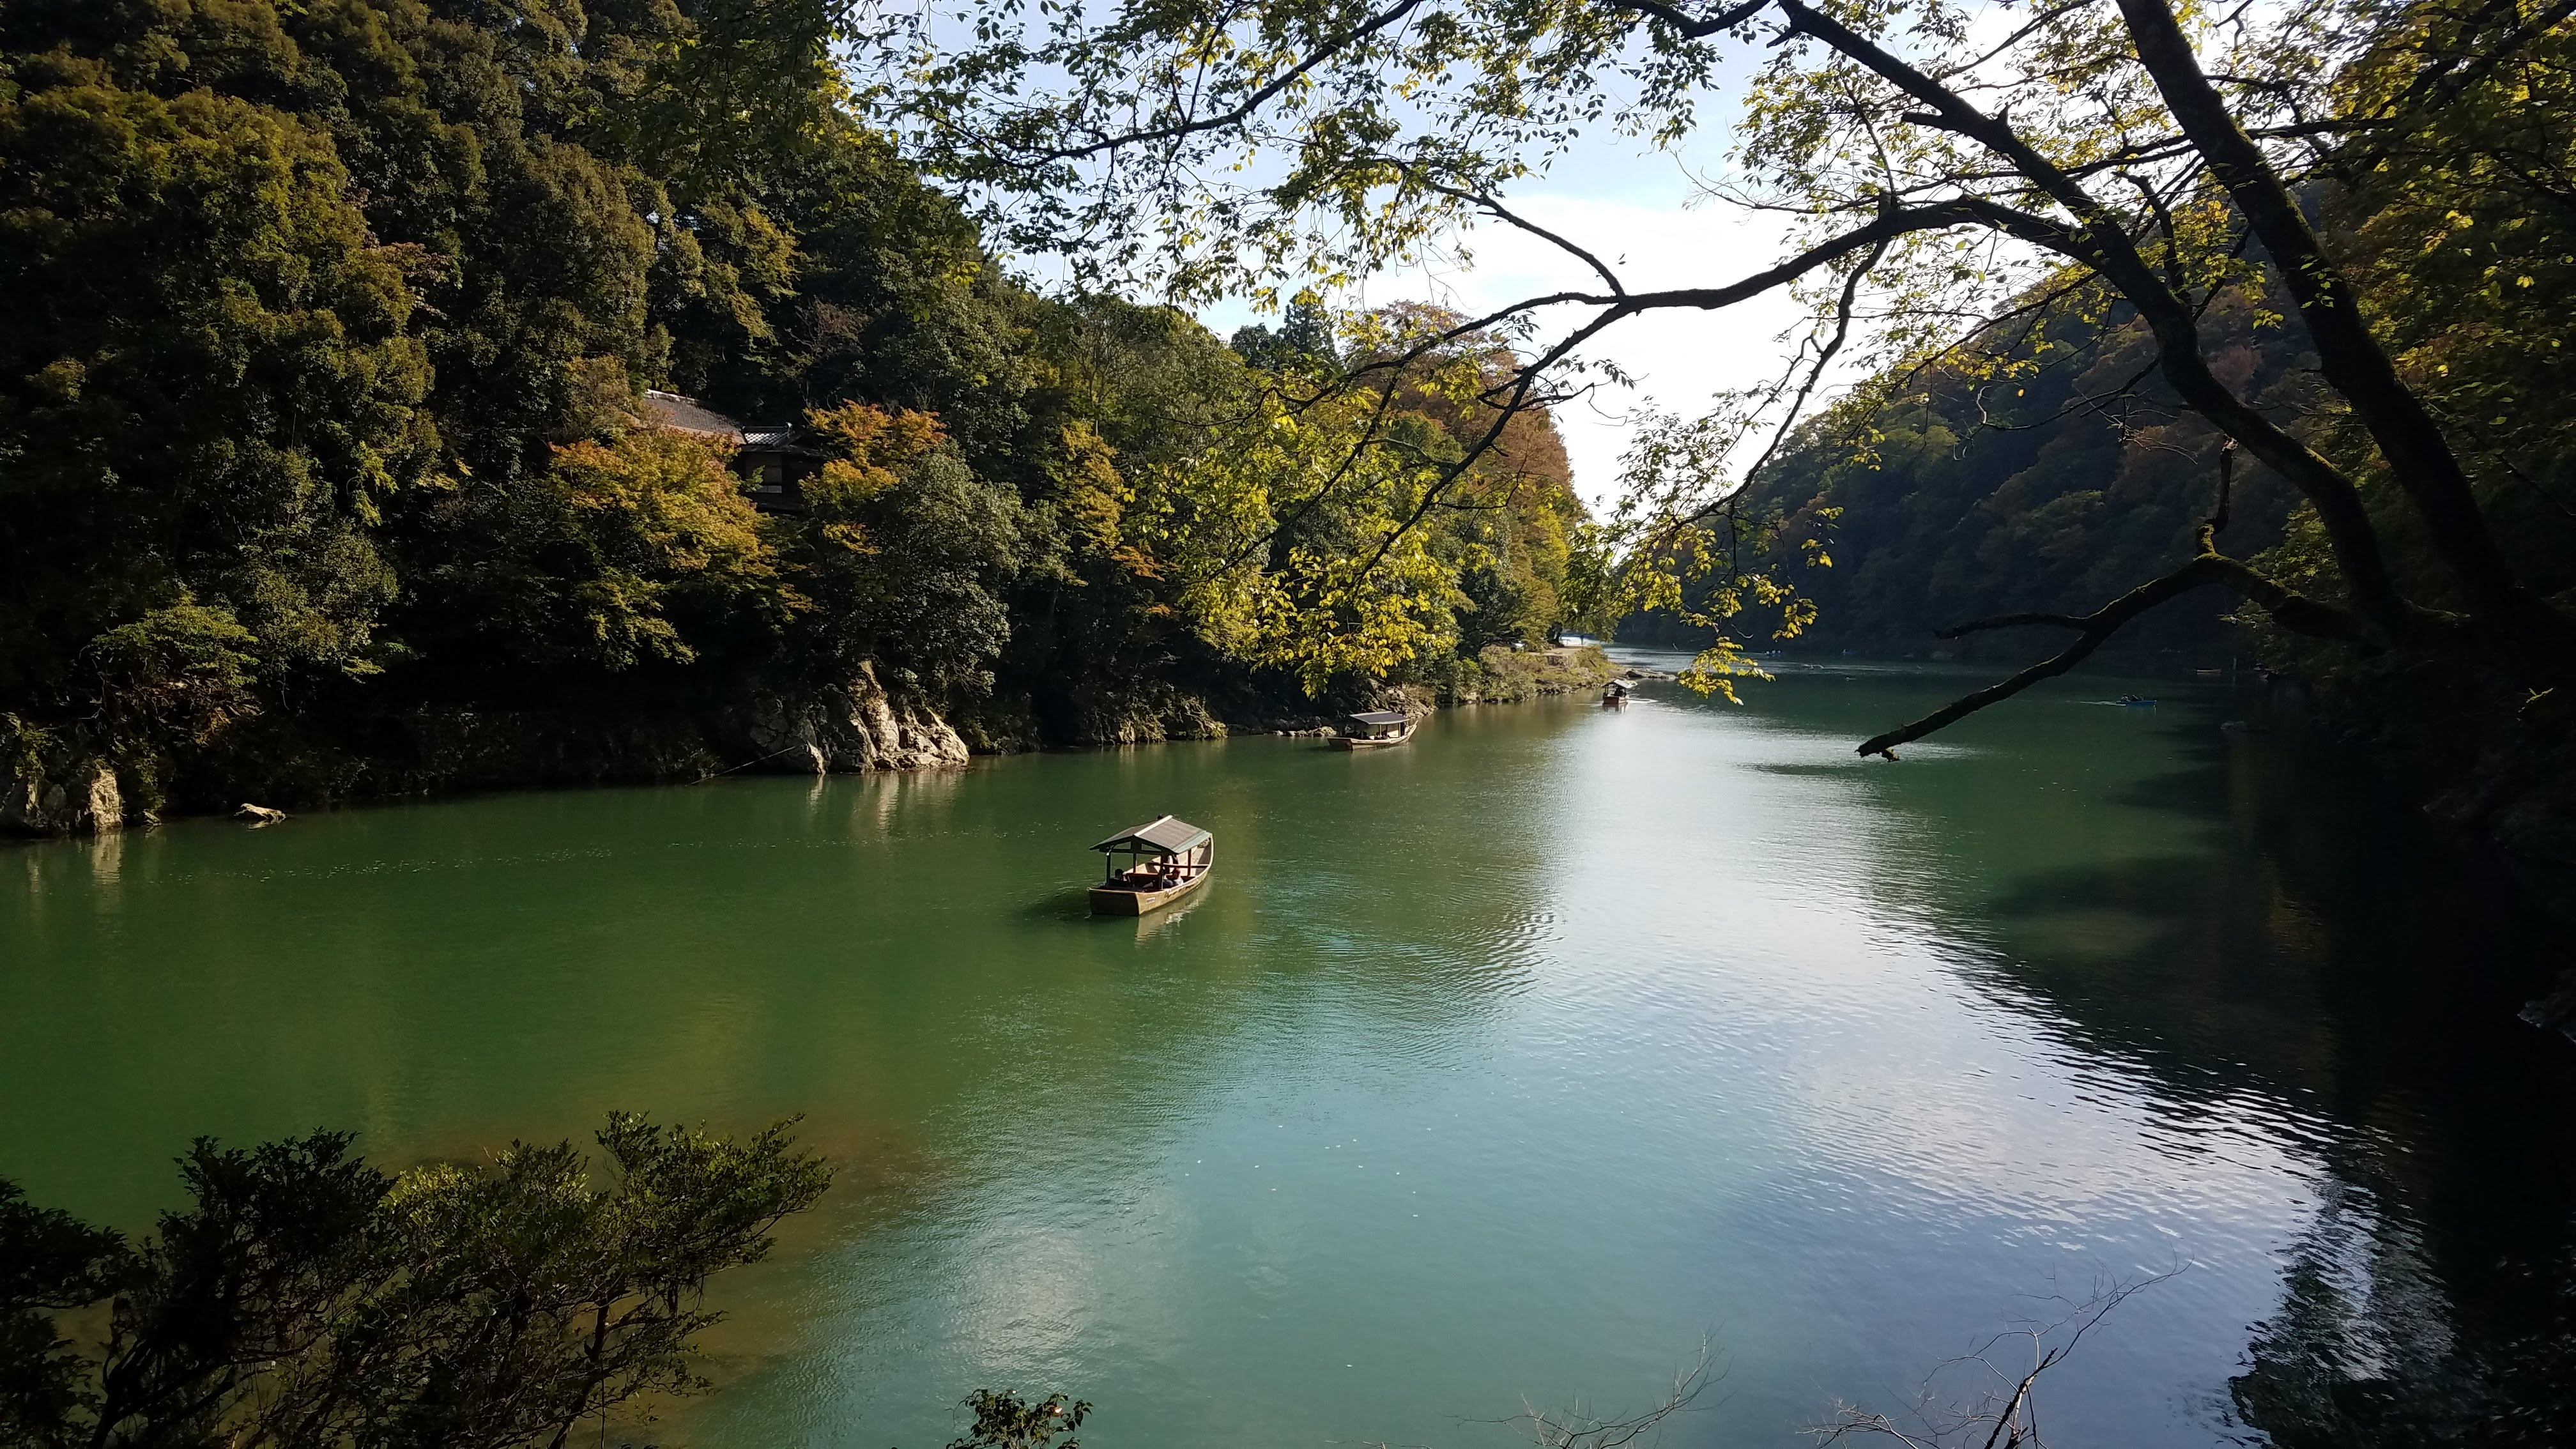 Katsura River - Arashiyama - 10-23-2019